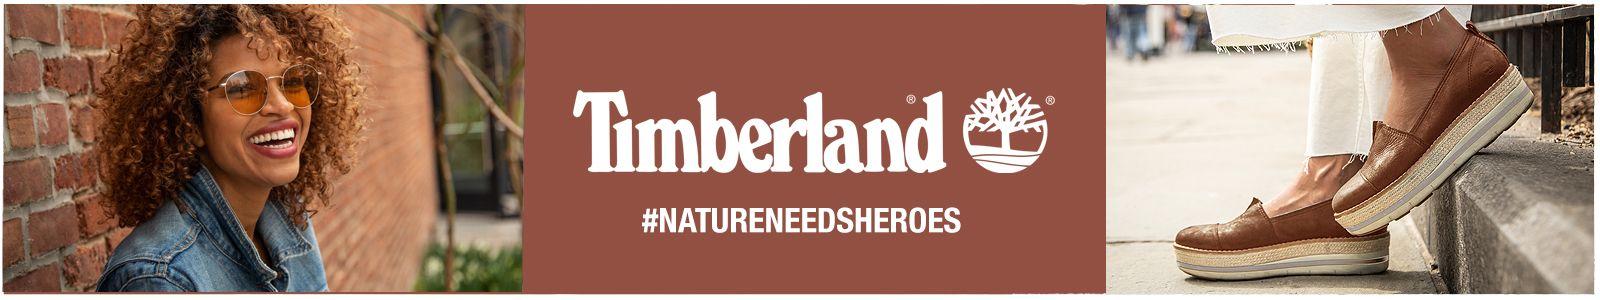 Timberland, #Natureneedsheroes